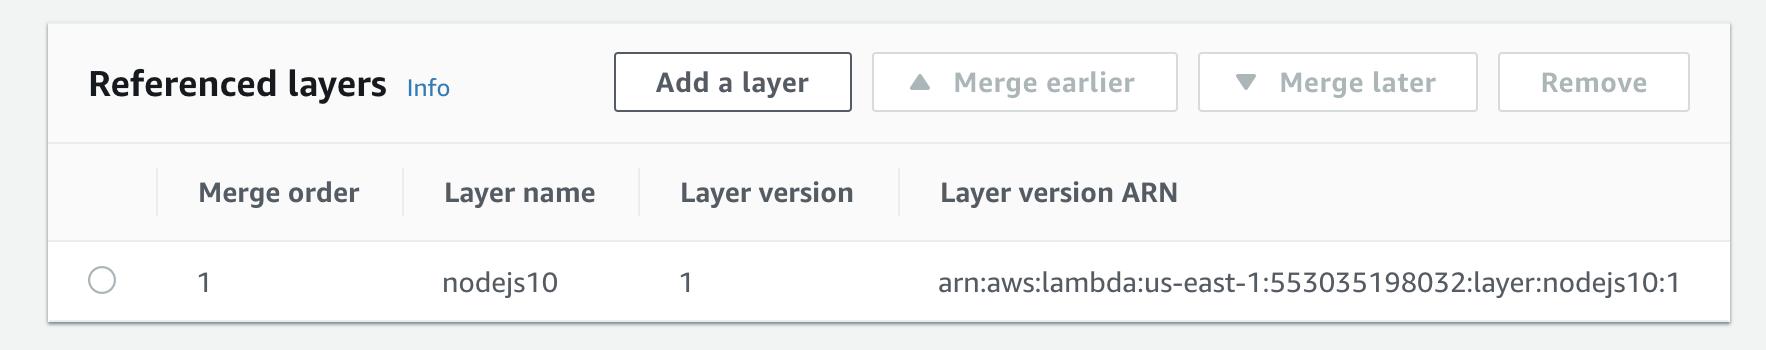 Add a layer